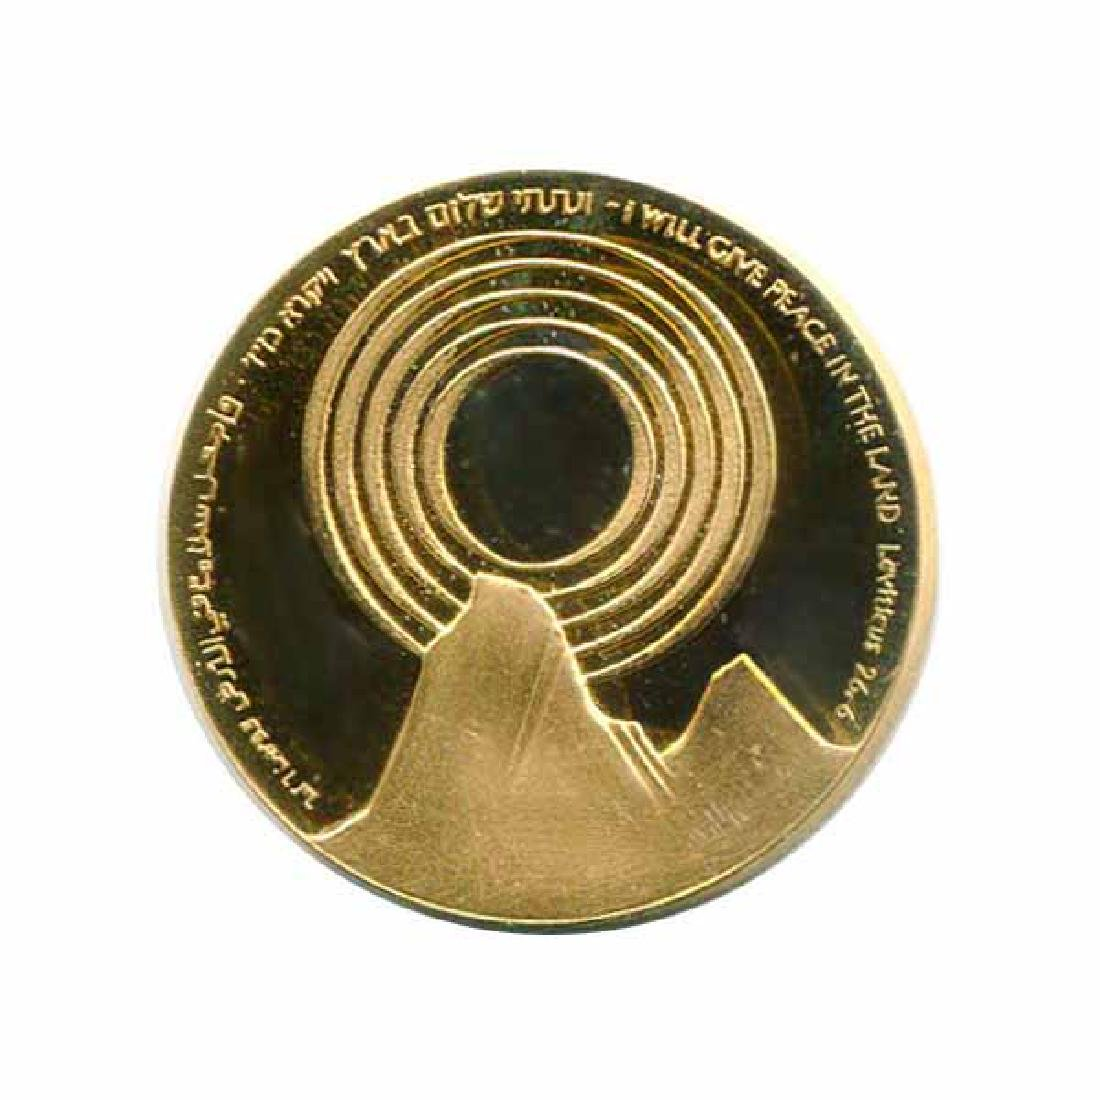 Israel Gold Medal 30g. Israel-Egypt Peace Treaty 1979